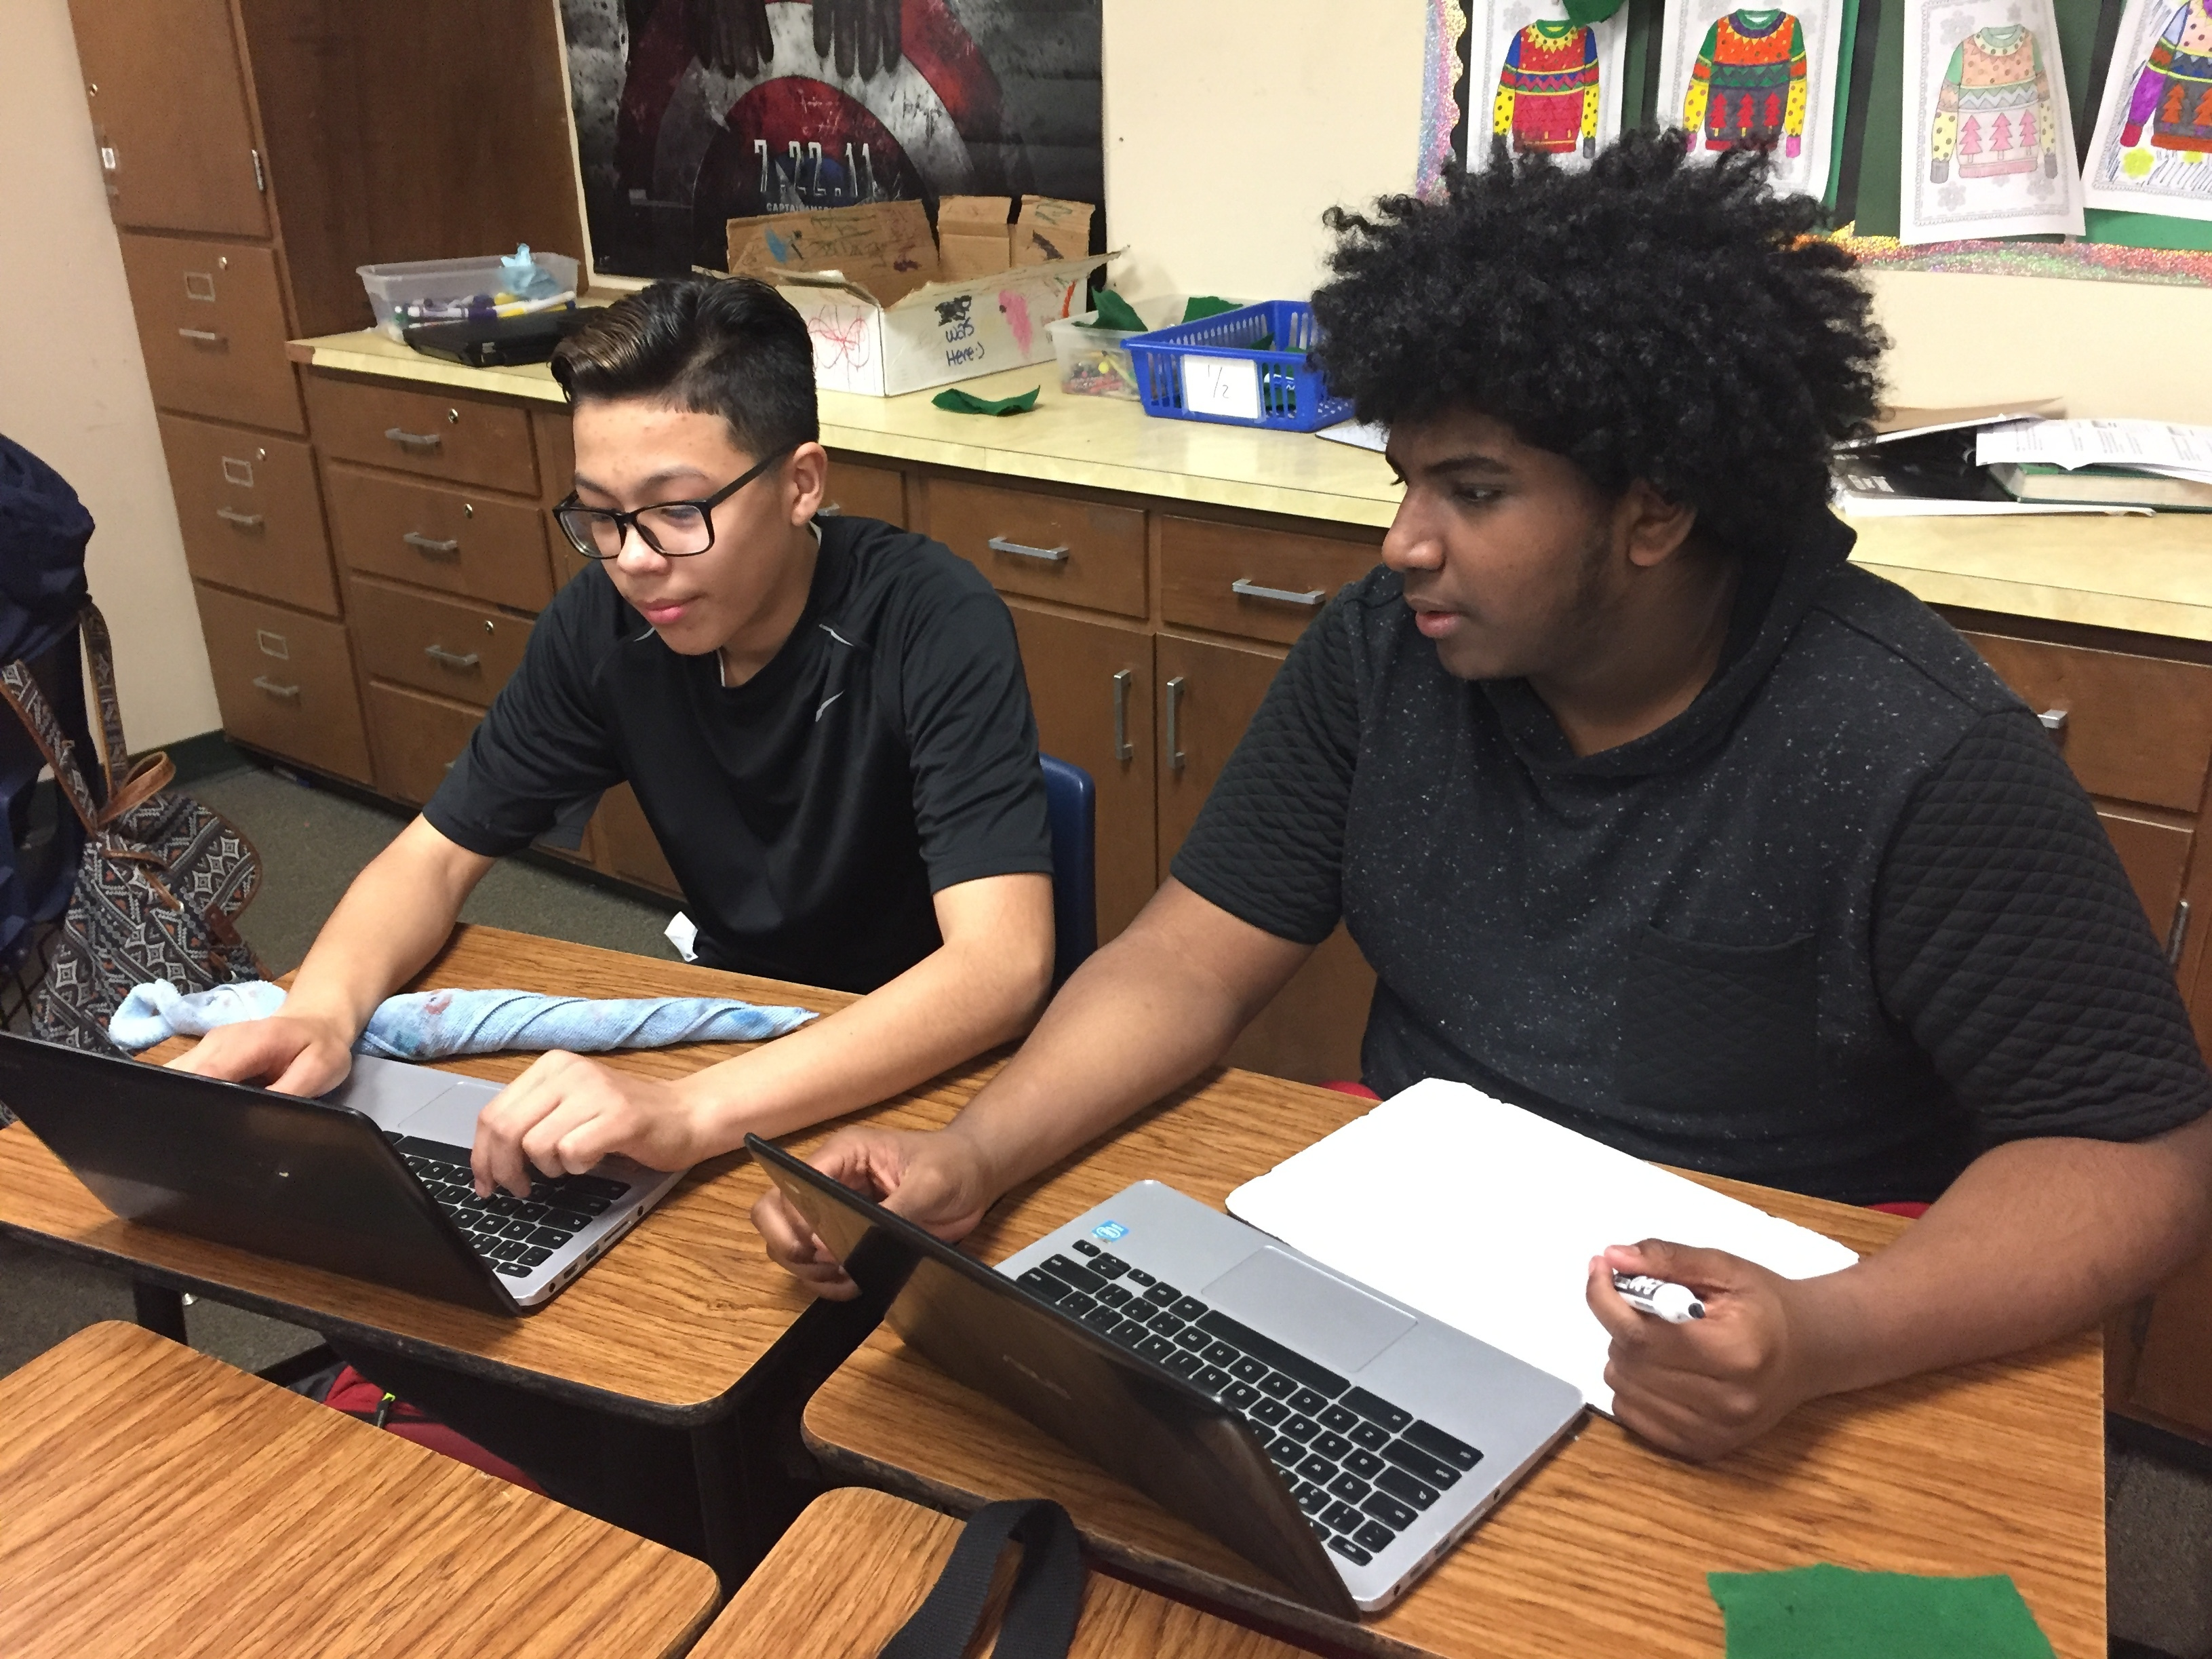 Schools Let Students Take Laptops Home In Hopes Of Curbing 'Summer Slide'